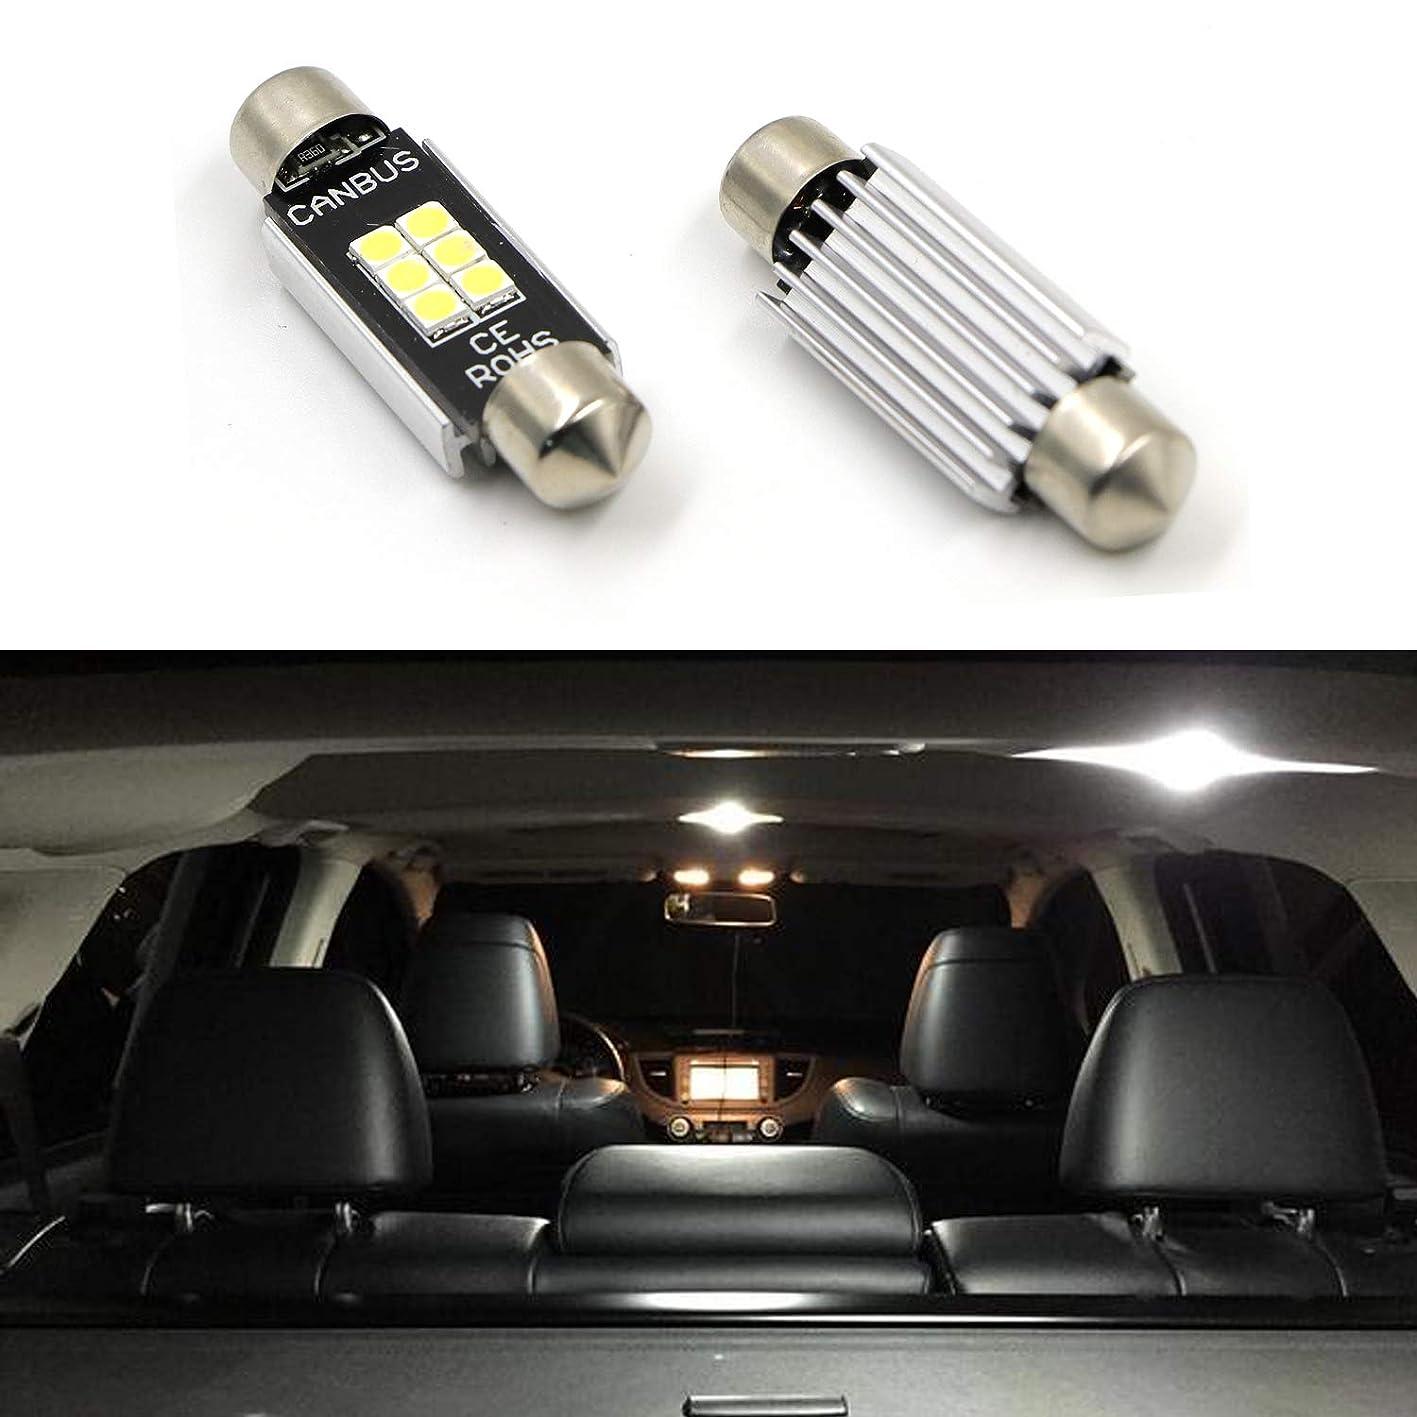 "6418 DE3423 DE3425 Dome Light 1.50"" 36MM 2pcs Festoon LED Bulbs For Interior Car Lights License Plate Trunk Side Marker Courtesy Extremely Bright 400 Lumens 3020 Chipset Canbus Error Free White 6000K niowjmttcpz831"